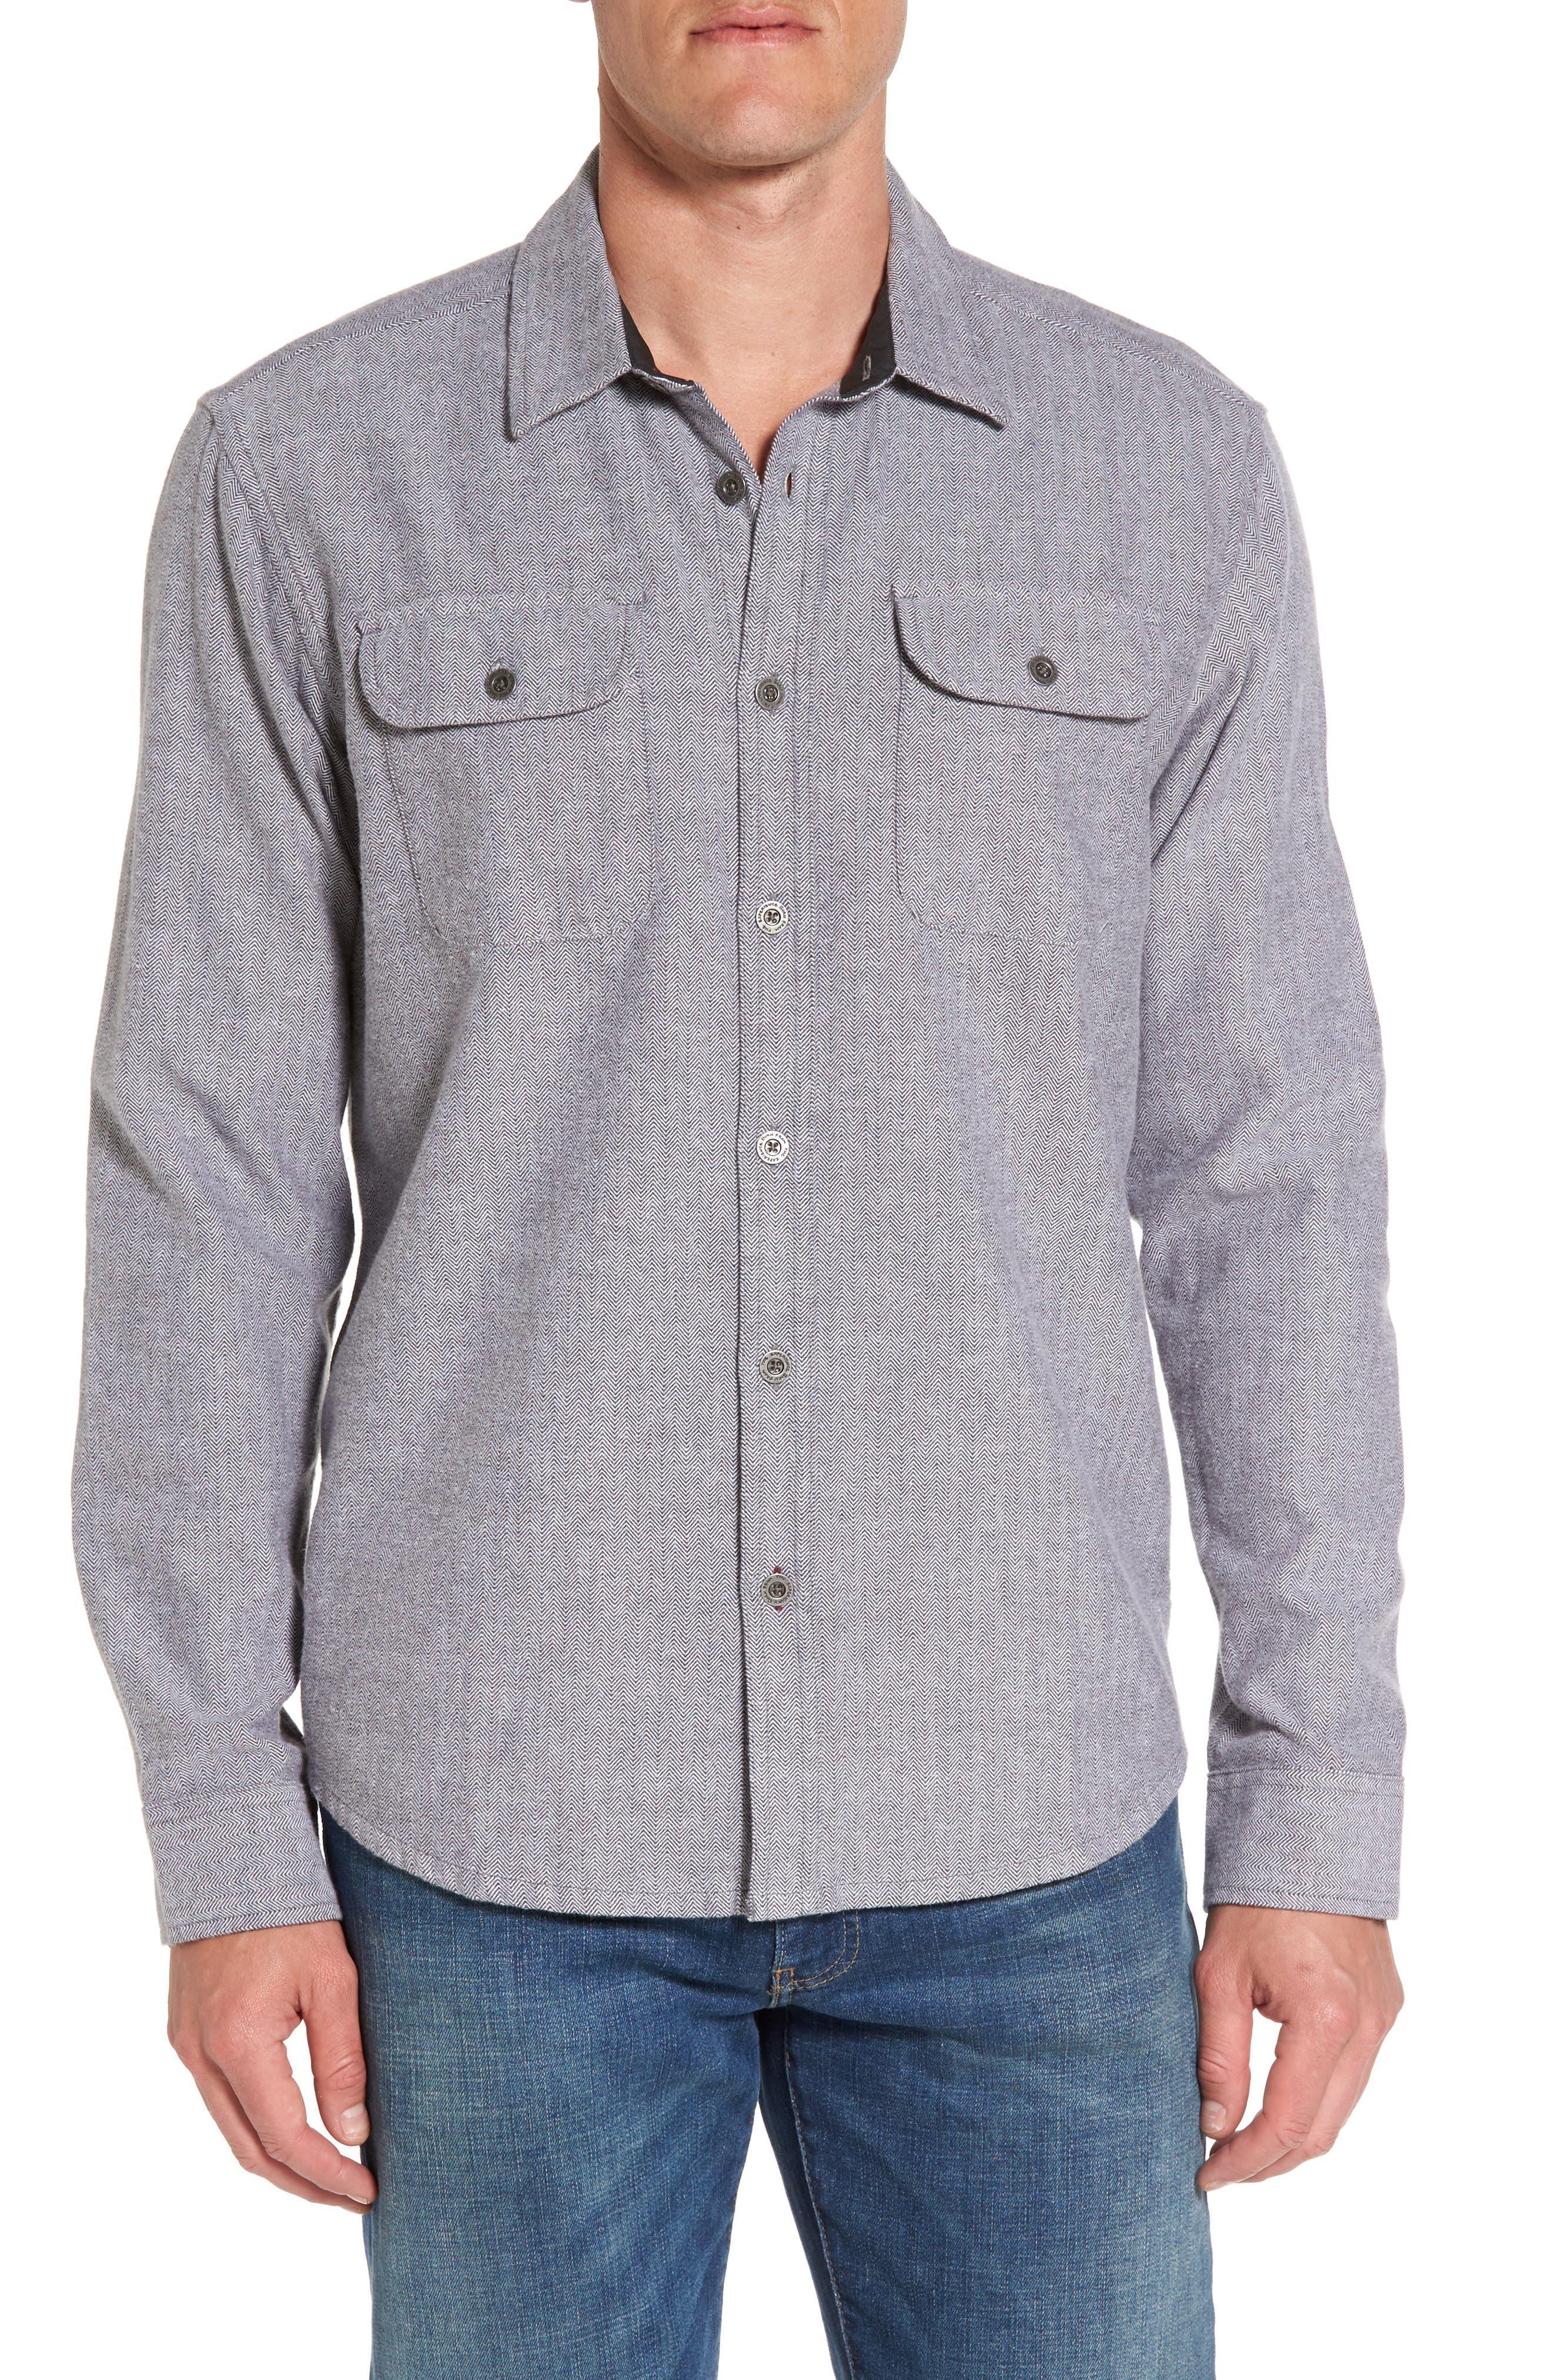 PRANA,                             Lybek Regular Fit Herringbone Flannel Shirt,                             Main thumbnail 1, color,                             027